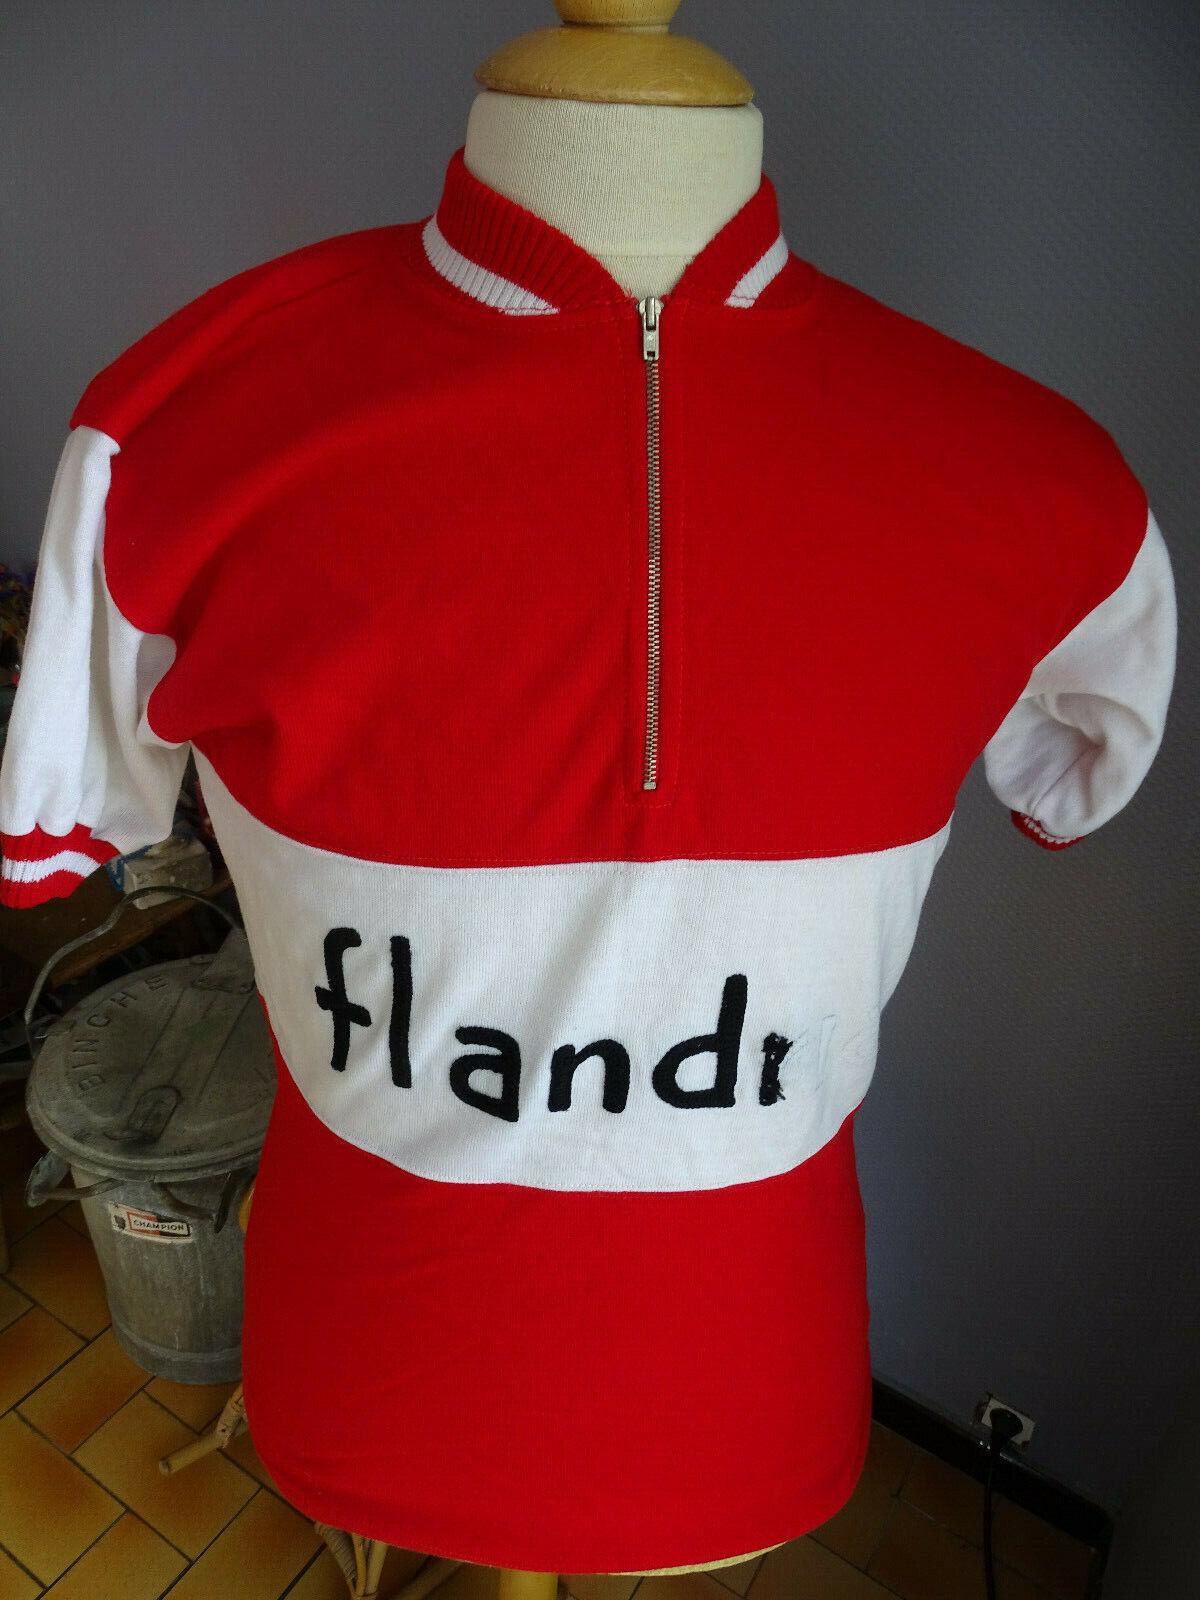 ANCIEN  MAILLOT CYCLISME CYCLISTE FLANDRIA  ANNEES 60-70 MAERTENS CYCLING  el estilo clásico